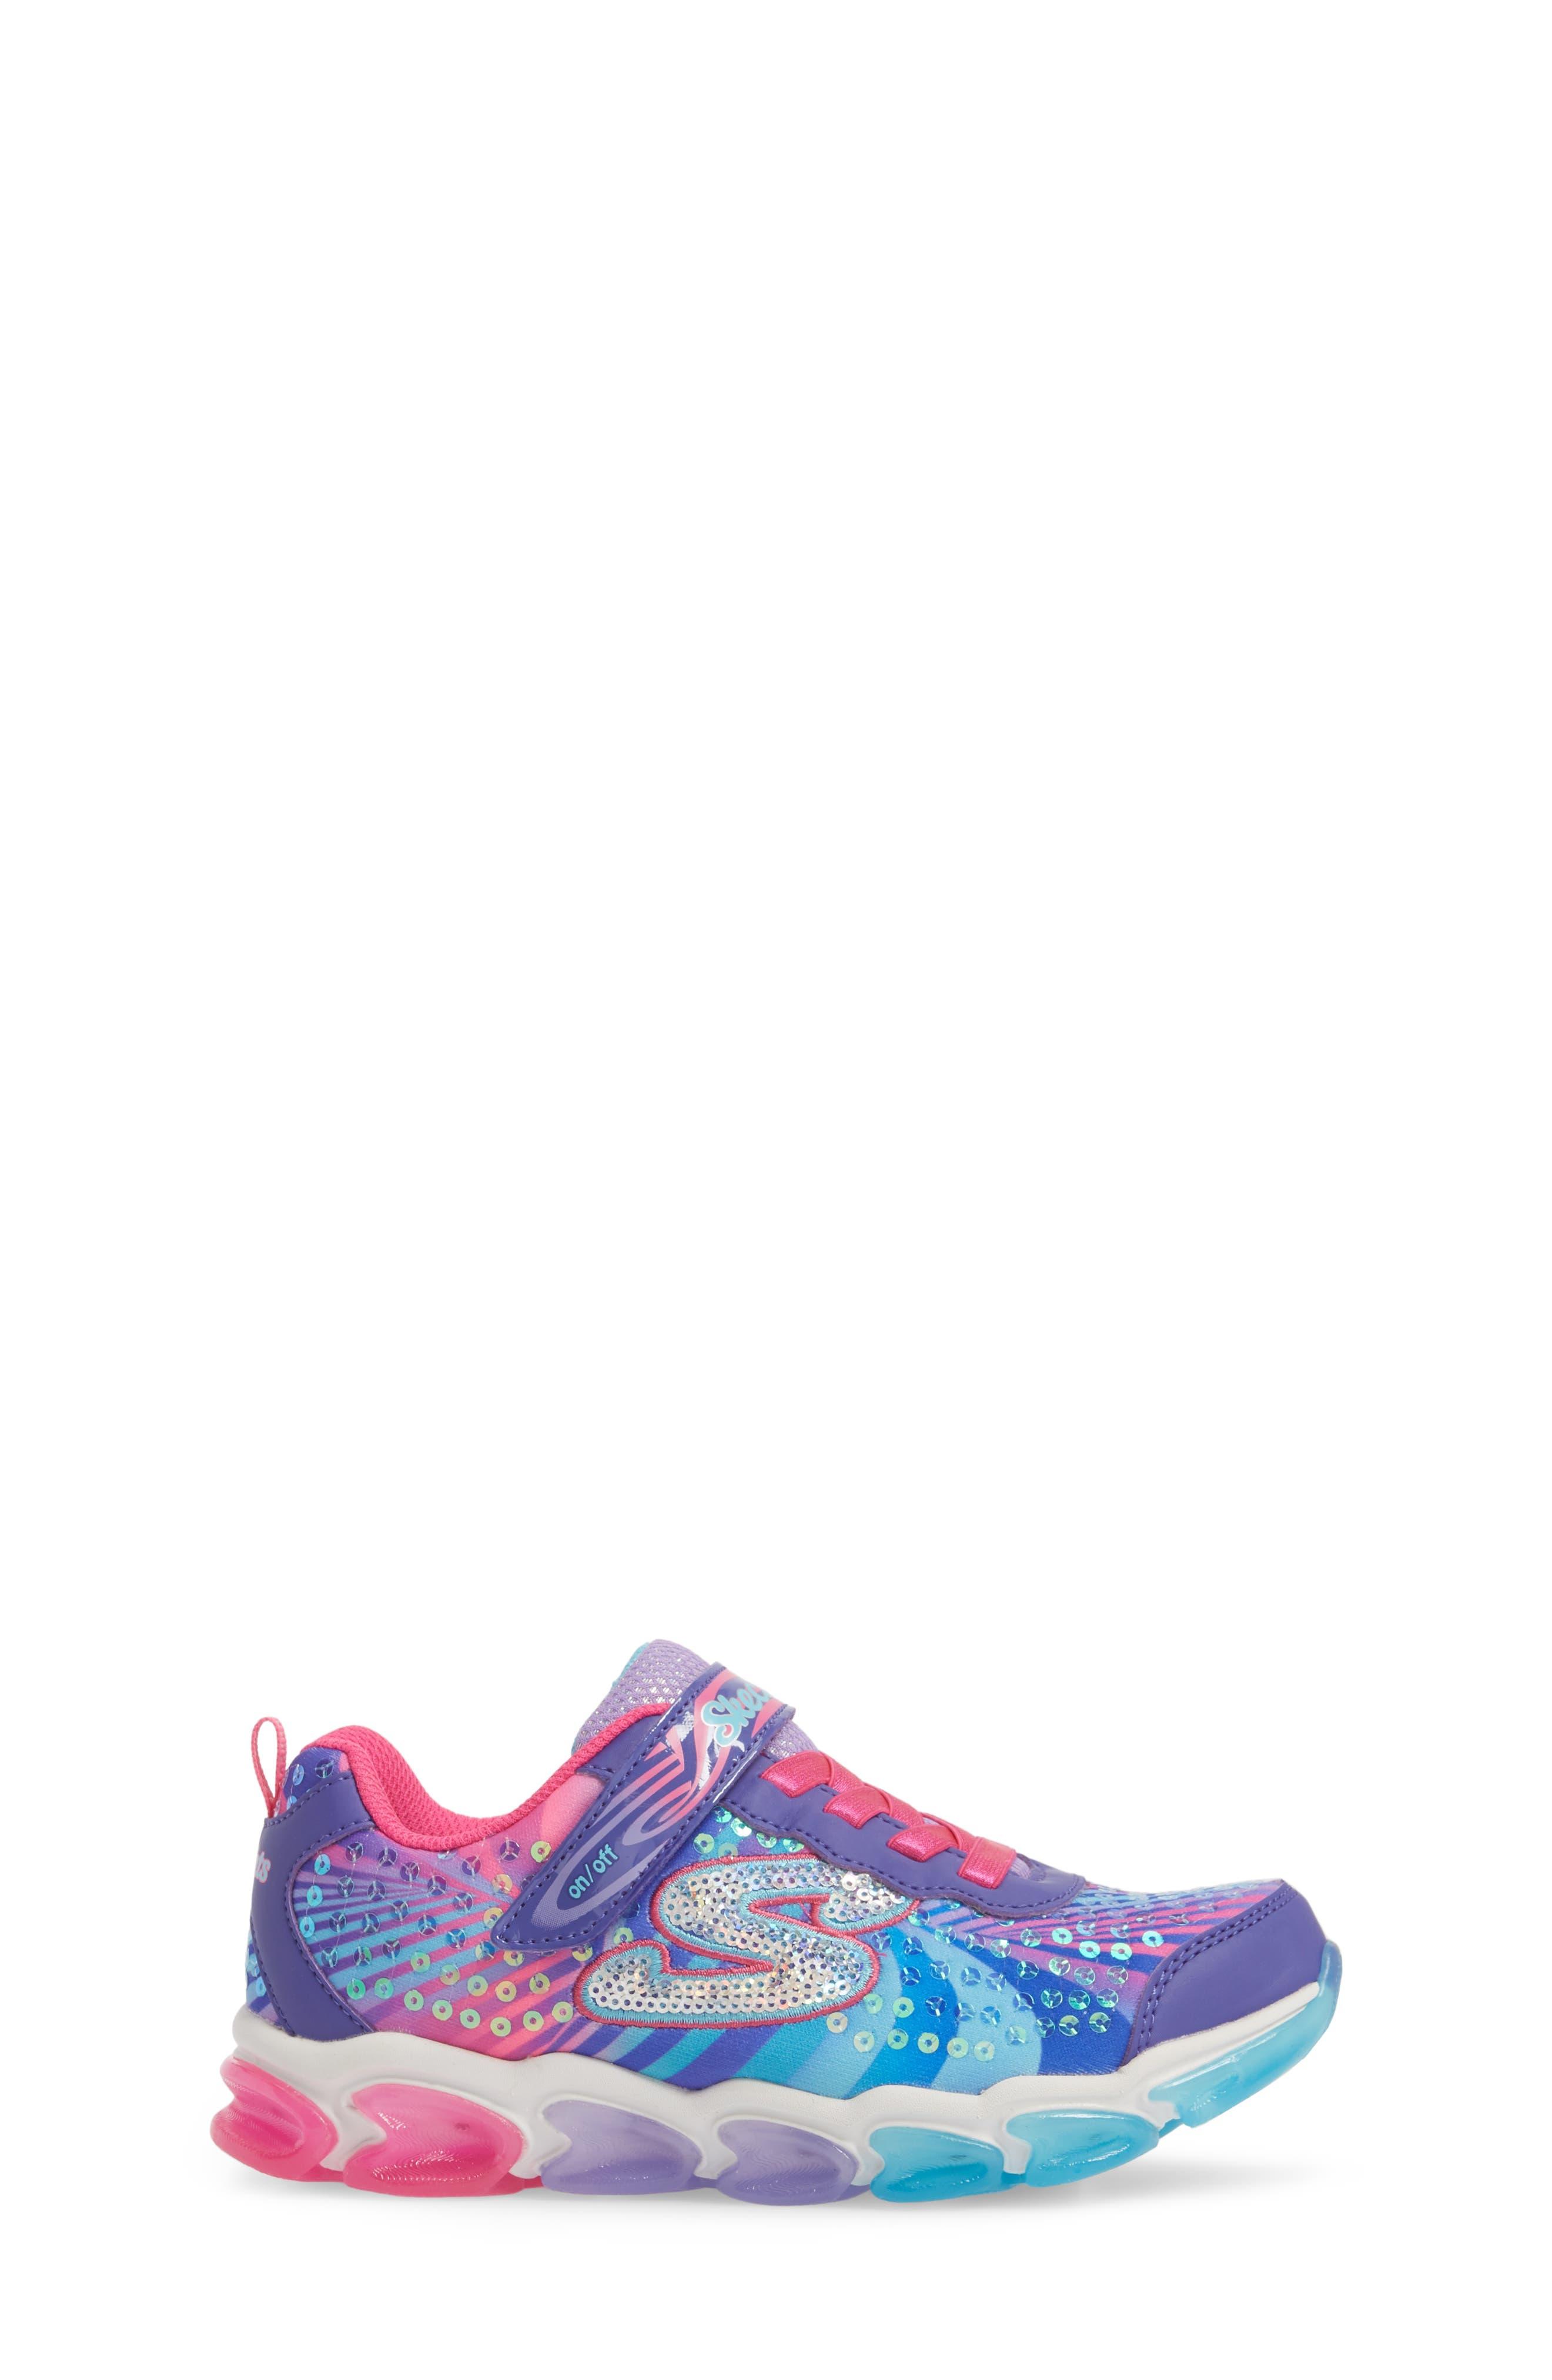 Jelly Beams Light-Up Sneaker,                             Alternate thumbnail 6, color,                             Purple/ Multi